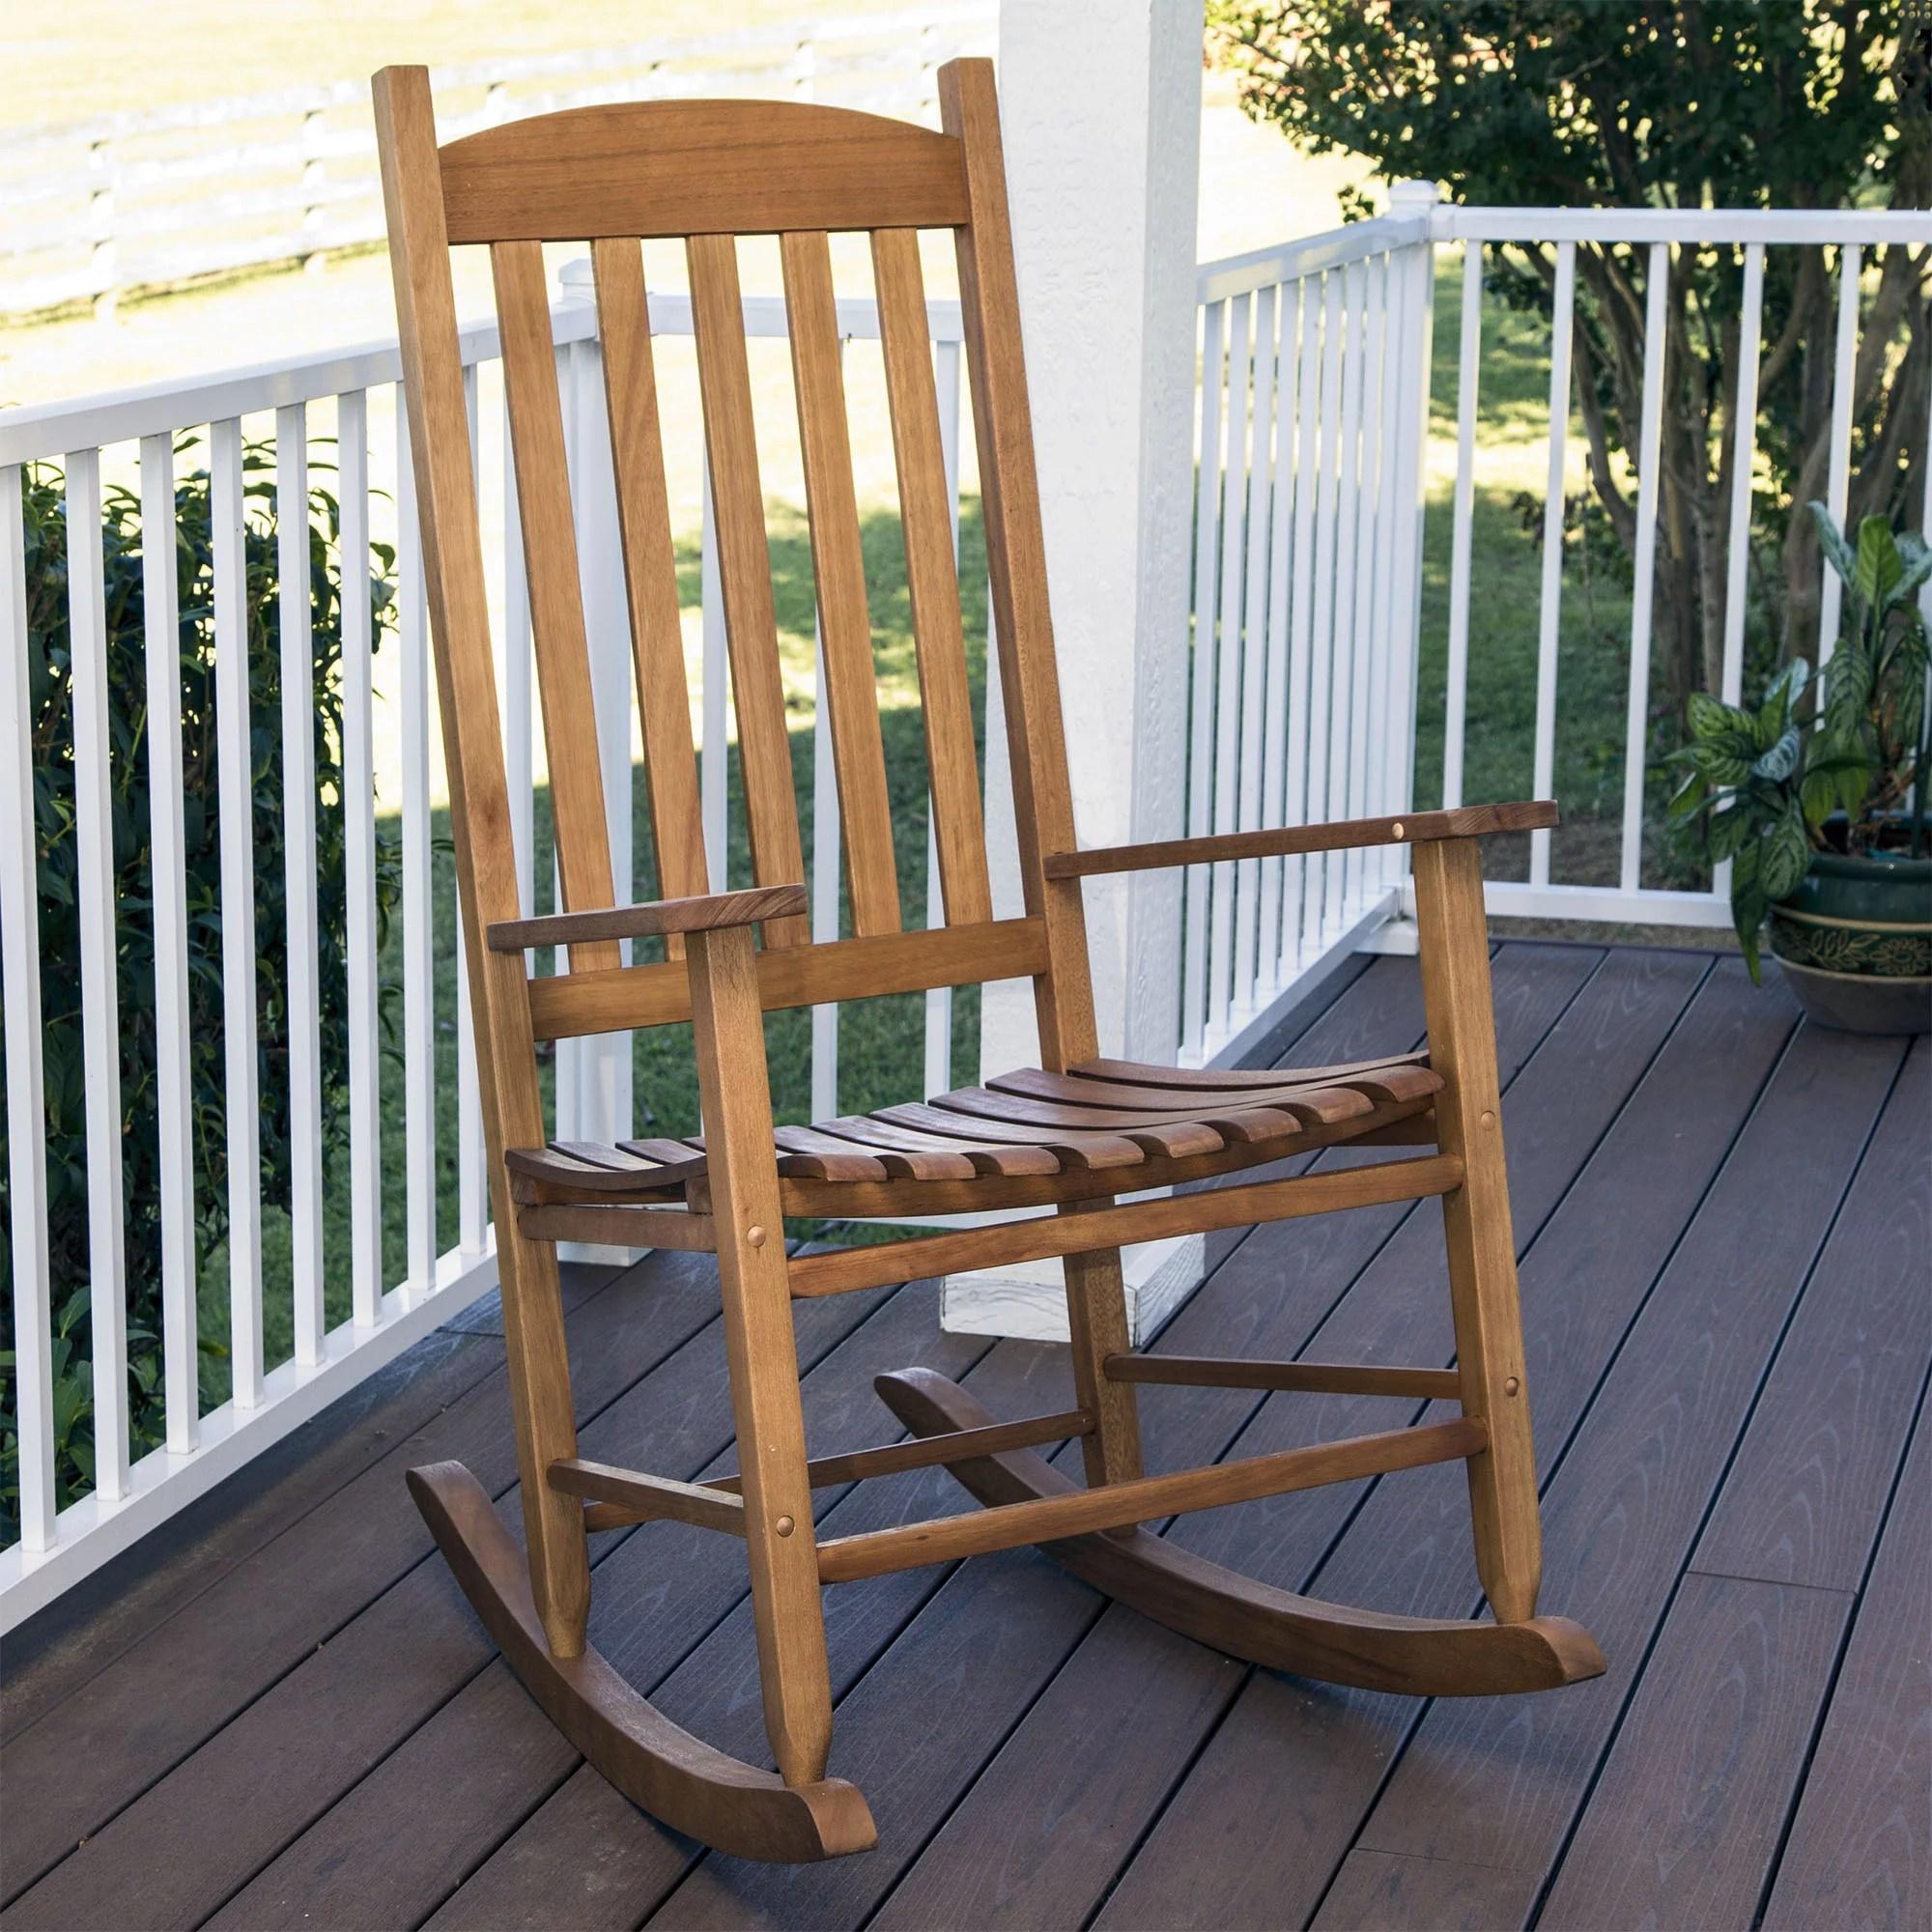 Mainstays Outdoor Wood Slat Rocking Chair  Walmartcom